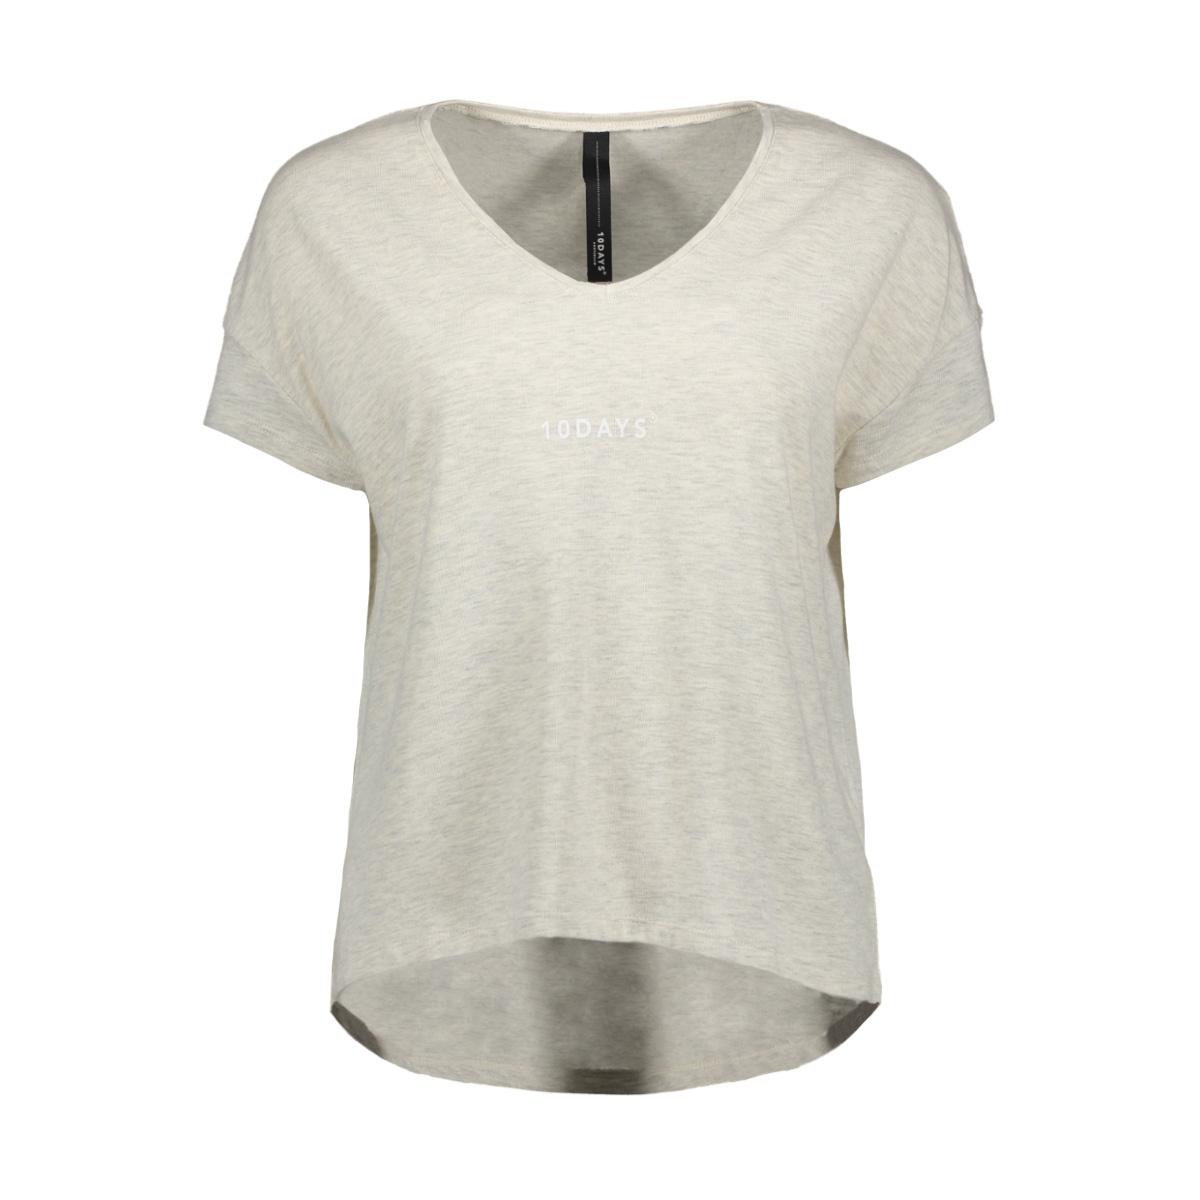 tee 20 744 9102 10 days t-shirt soft white melee